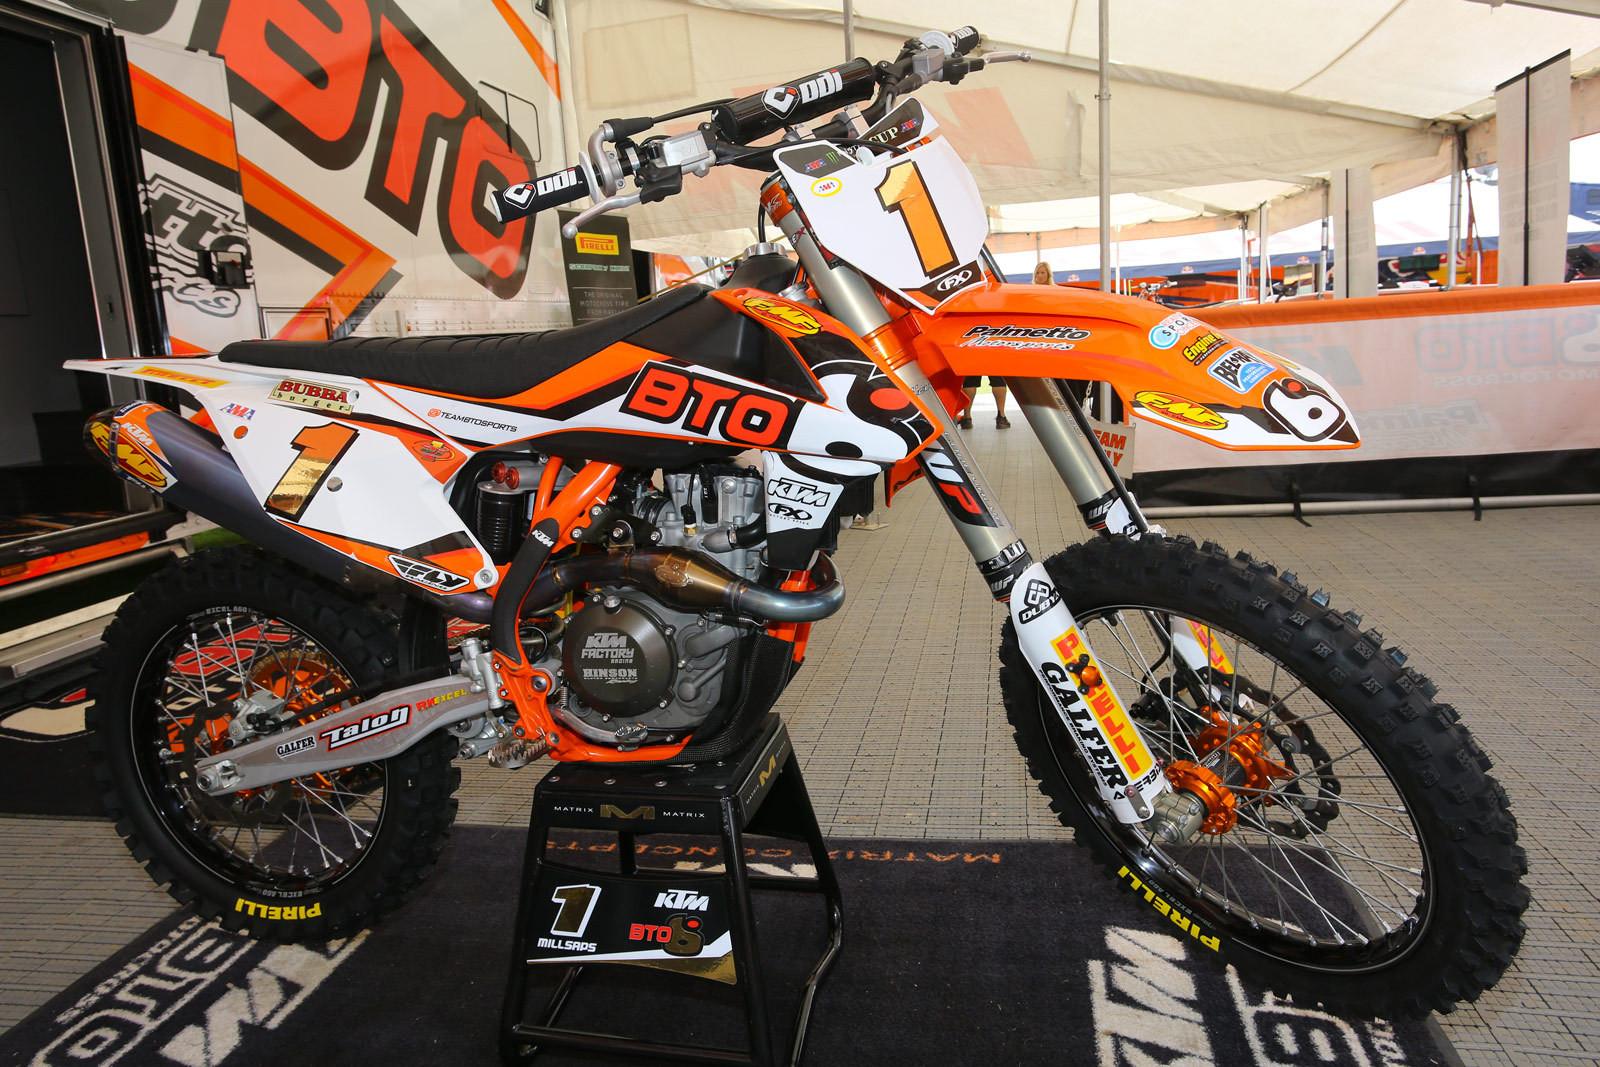 Davi Millsaps - Vital MX Pit Bits: Monster Energy Cup - Motocross Pictures - Vital MX